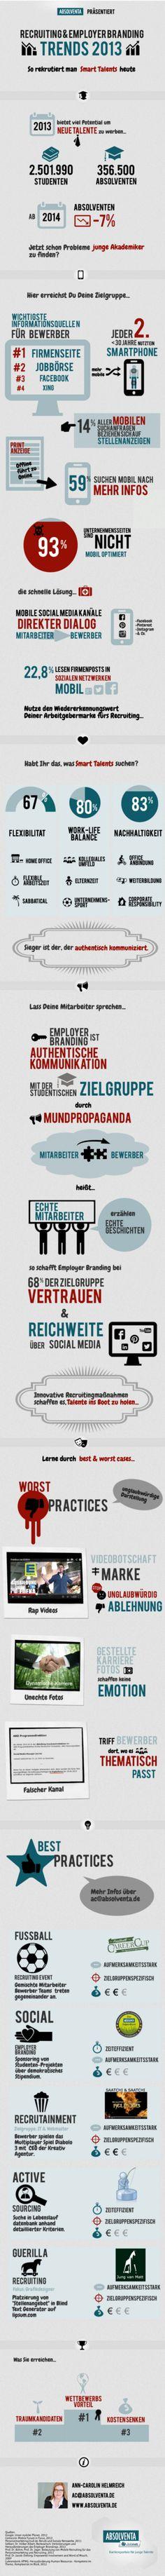 Infografik Recruiting Trends 2013 - in voller Größe: www.absolventa.de/blog/Infografik-hr-trends #Employer Branding #Mobile Recruiting #Smart Talents